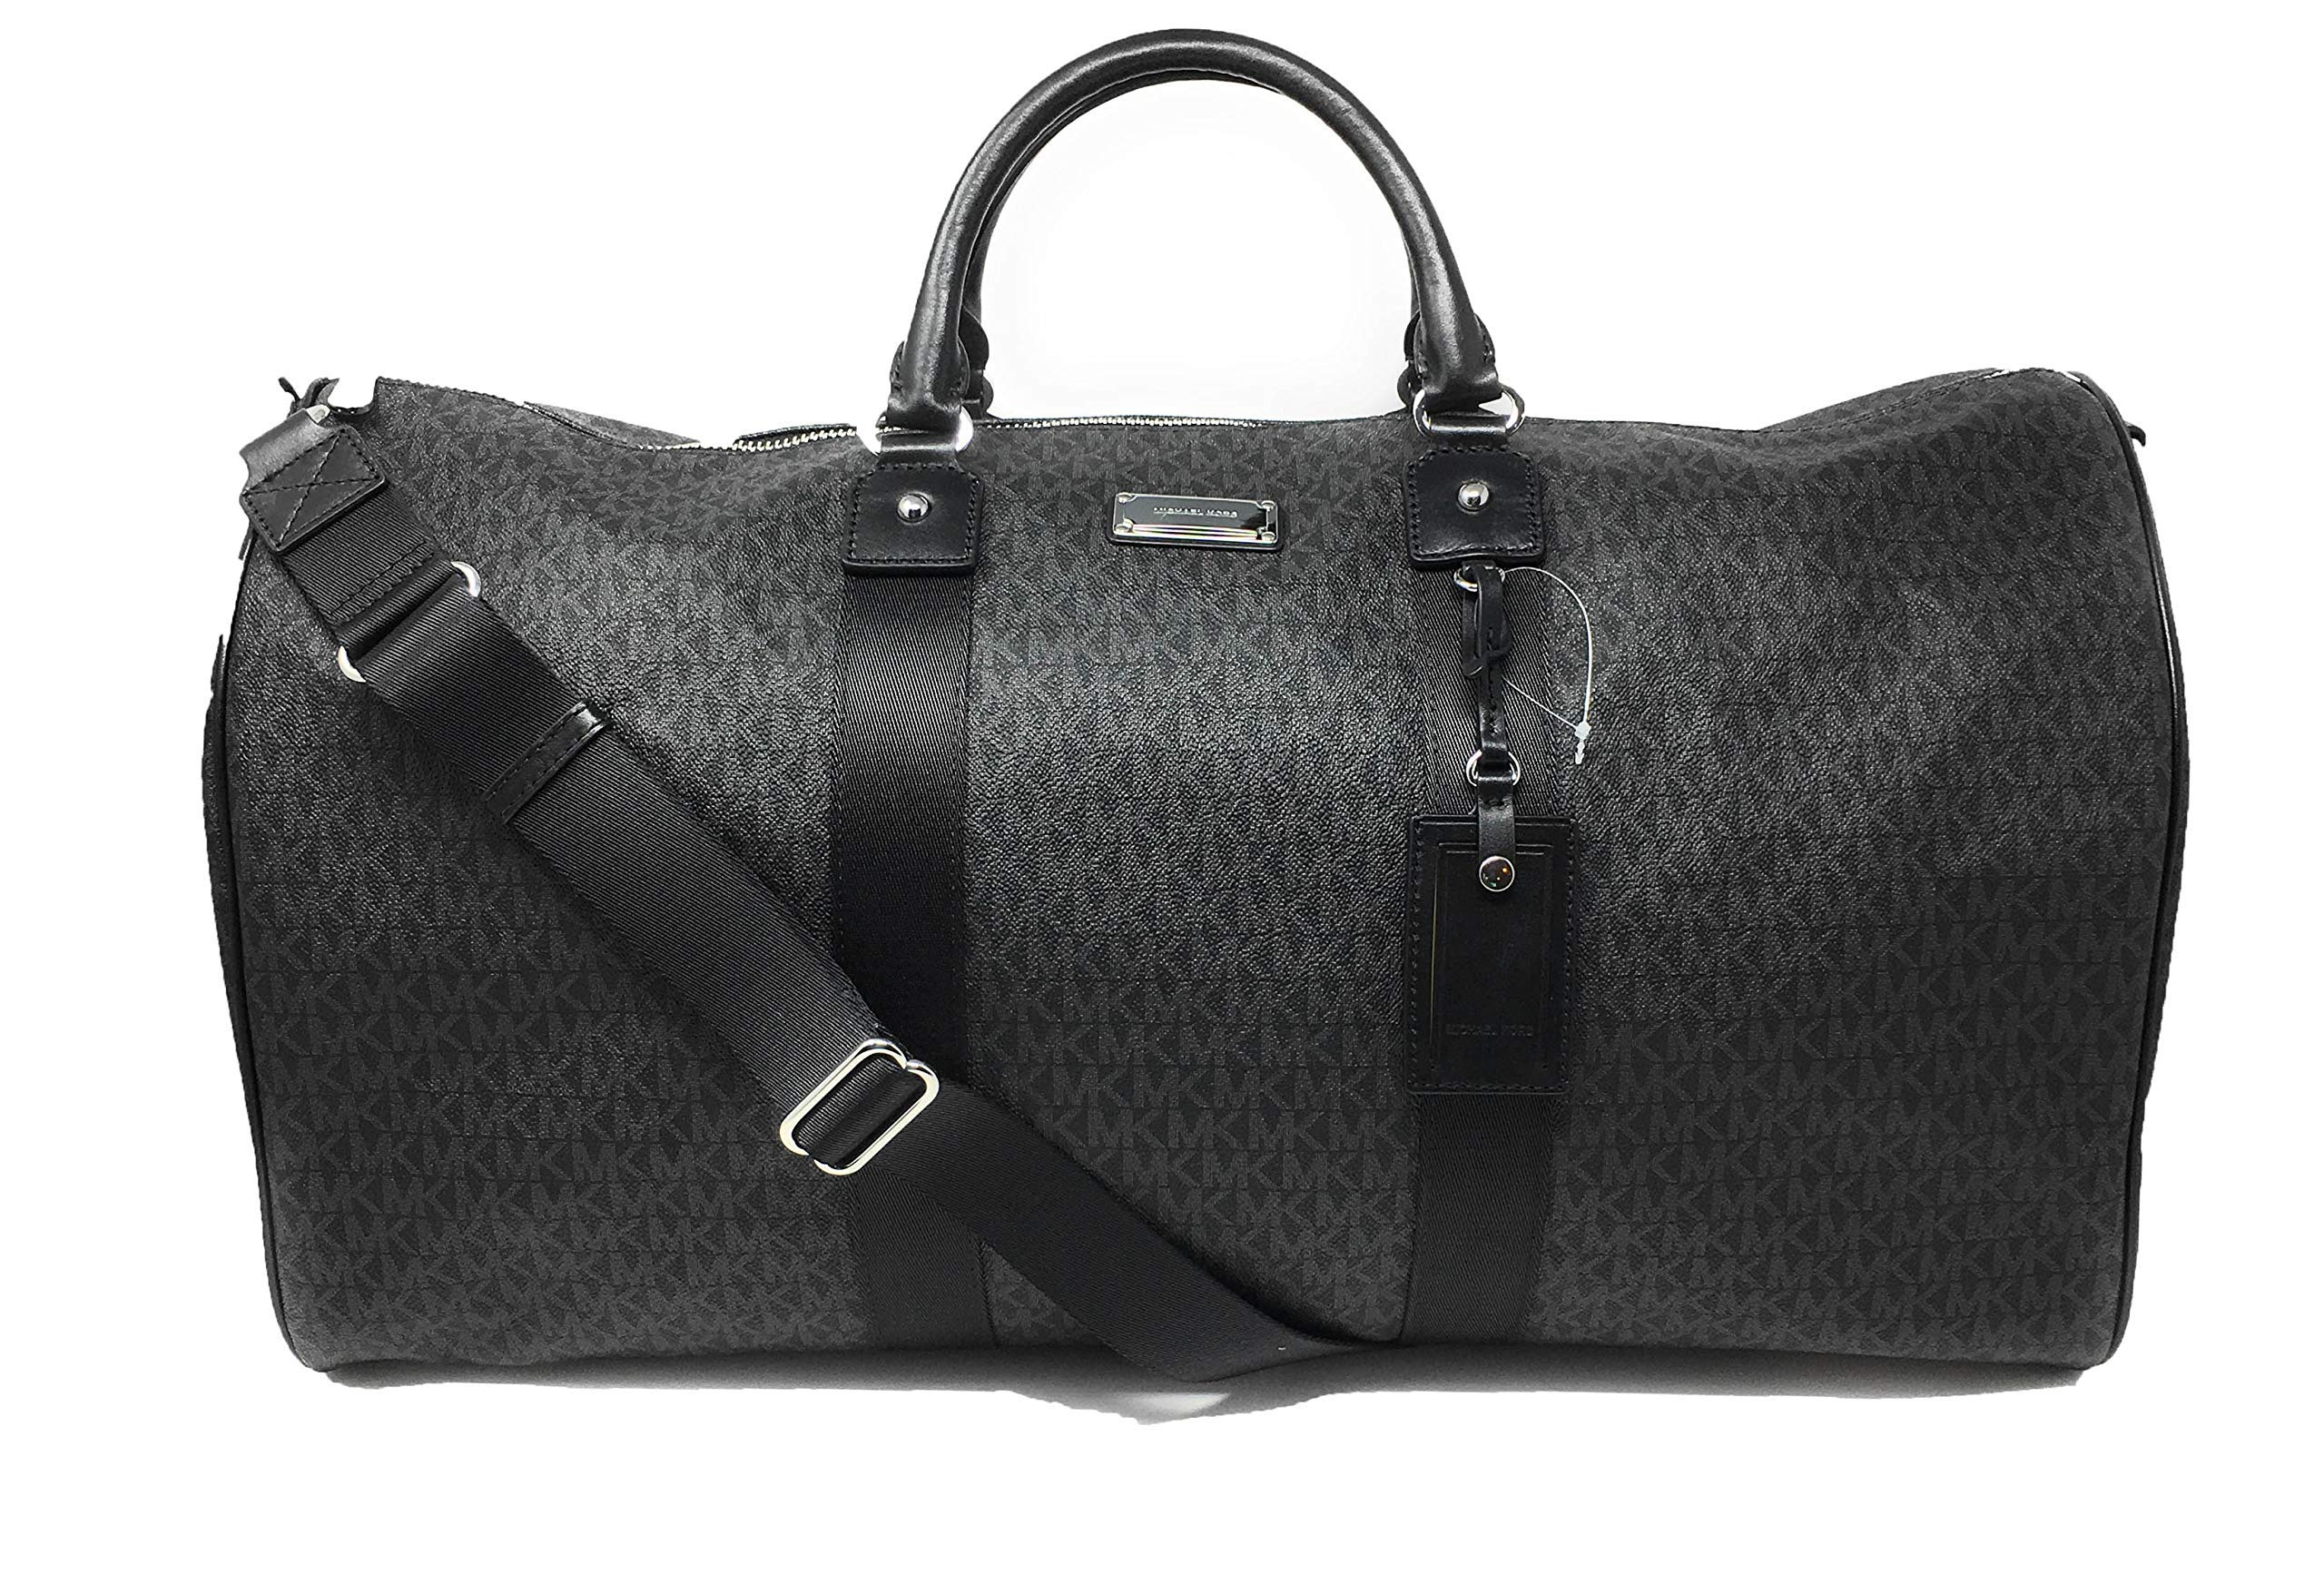 Michael Kors Michael Kors Leather PVC Travel Logo Duffle Large Bag Printed Duffel Luggage Black